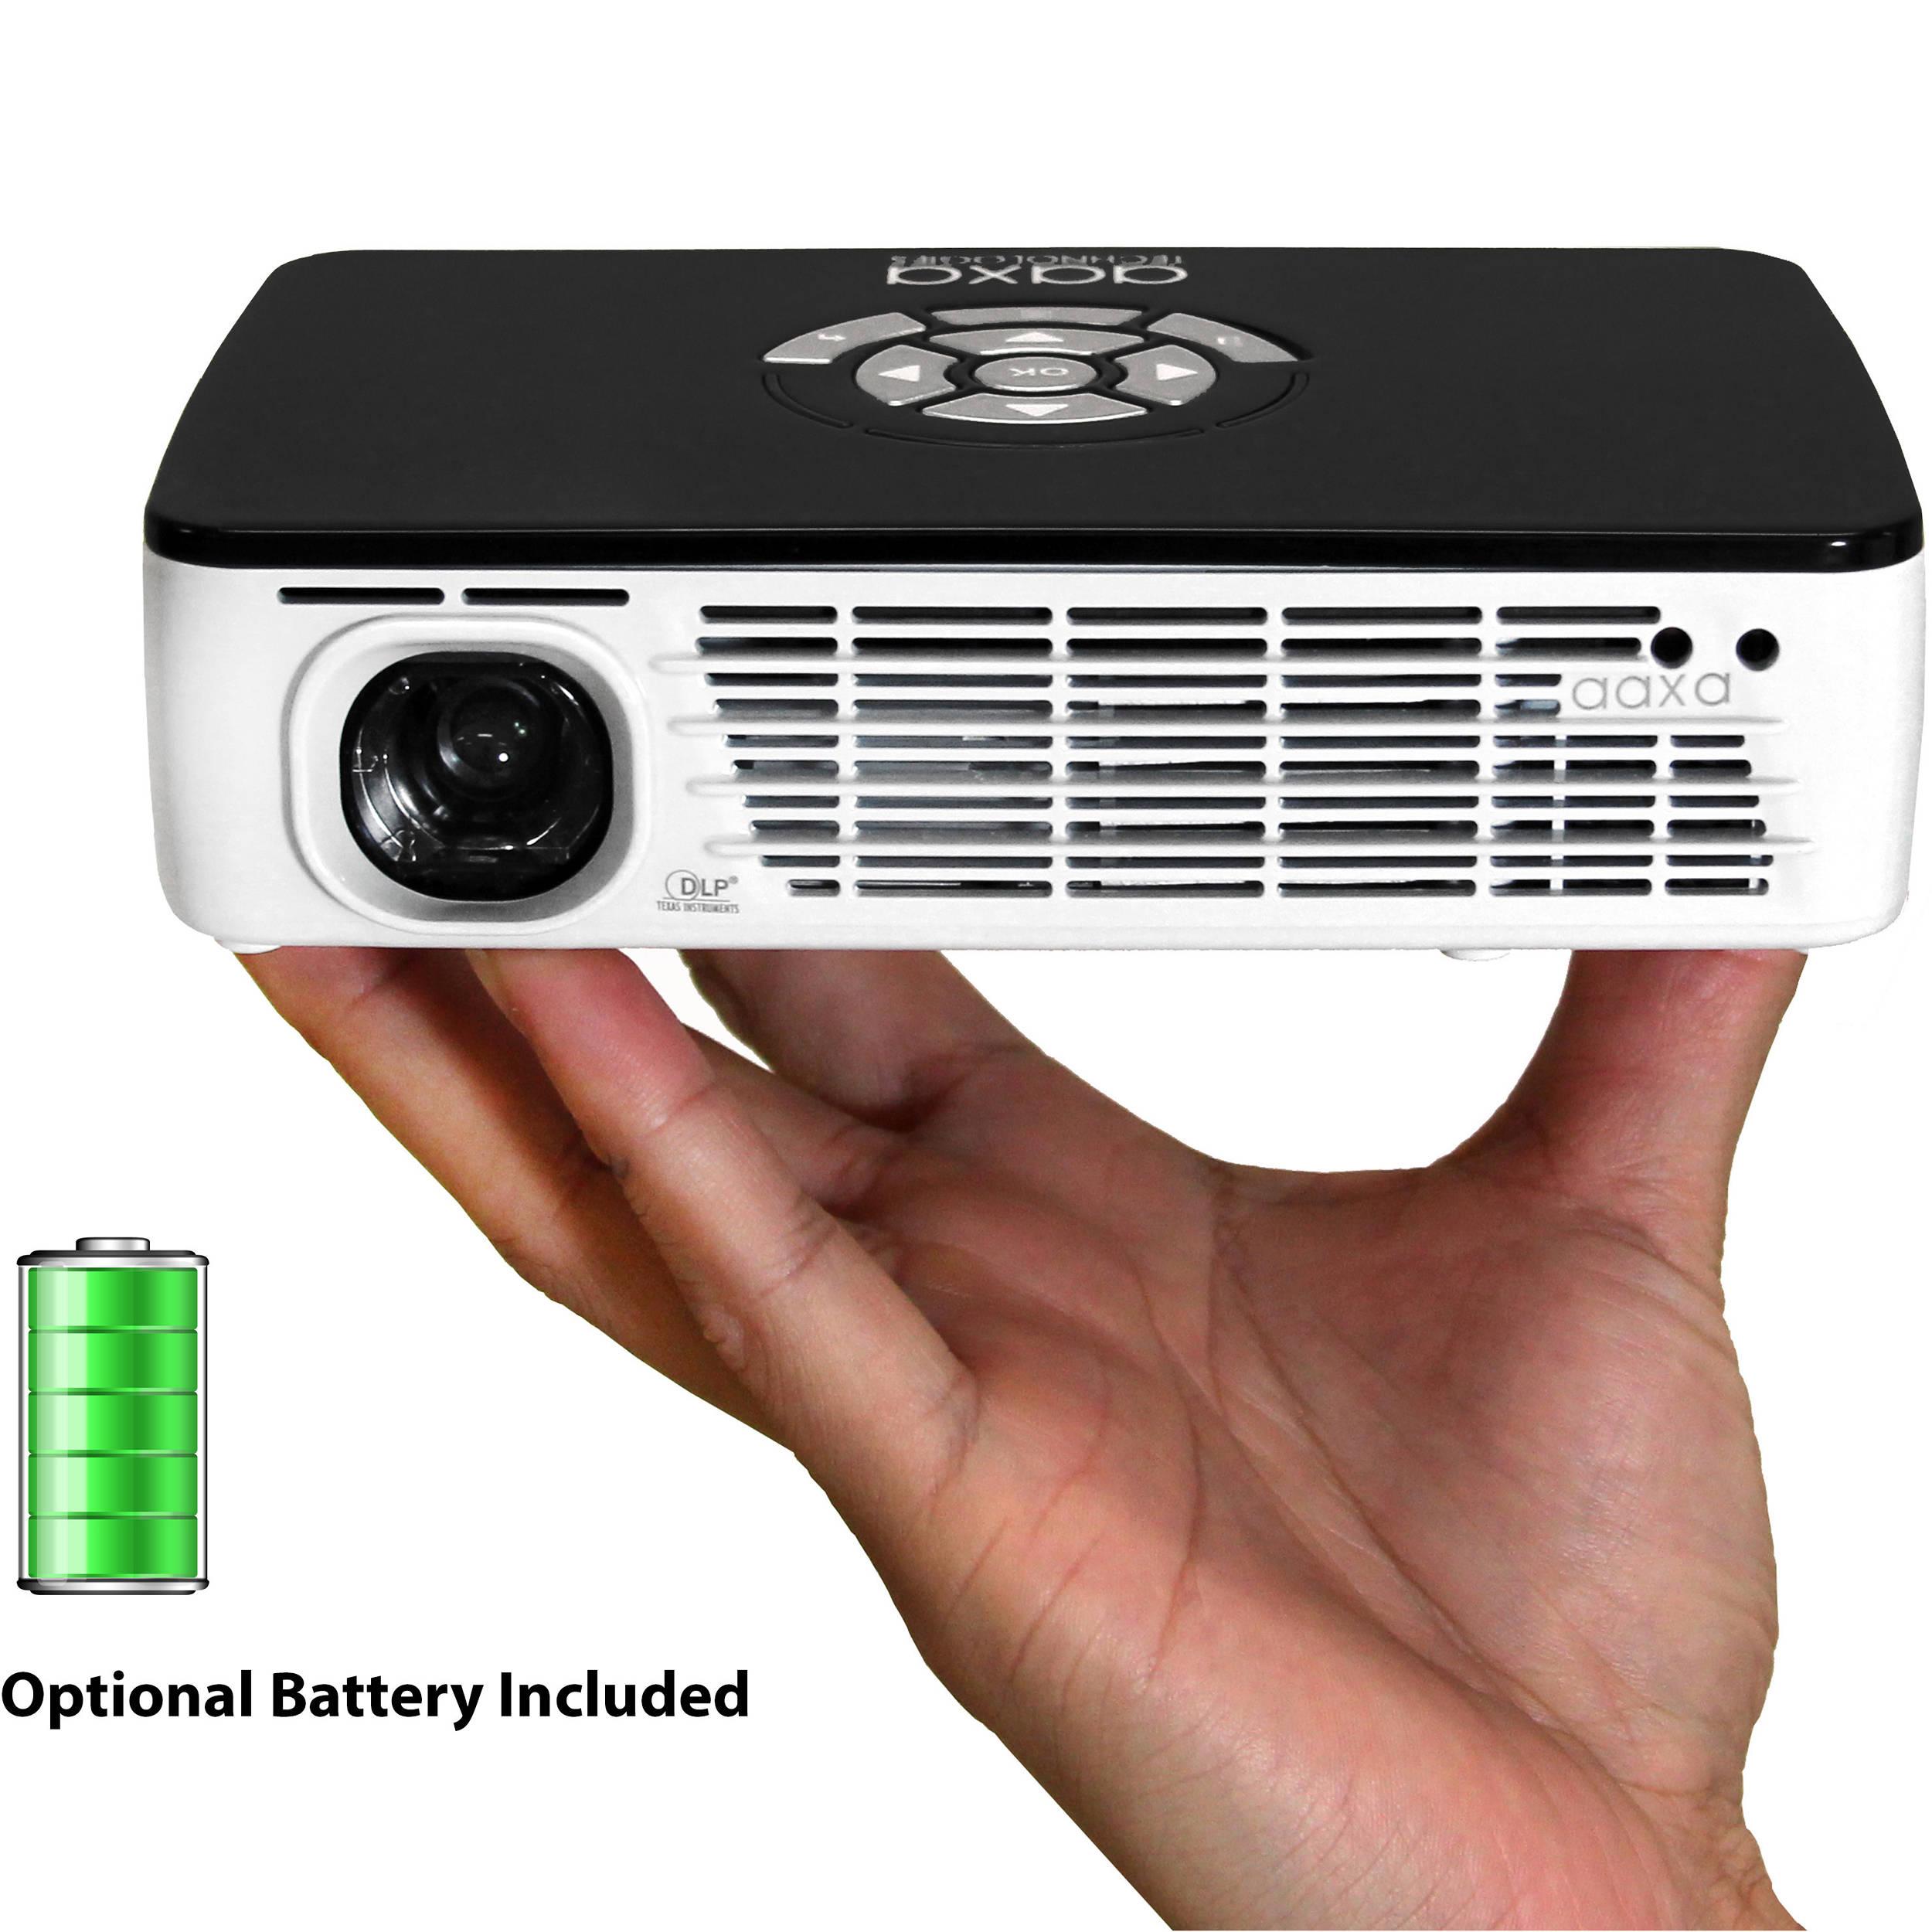 Aaxa technologies p300 400 lumen hd pico projector kp 600 for Hd pico projector